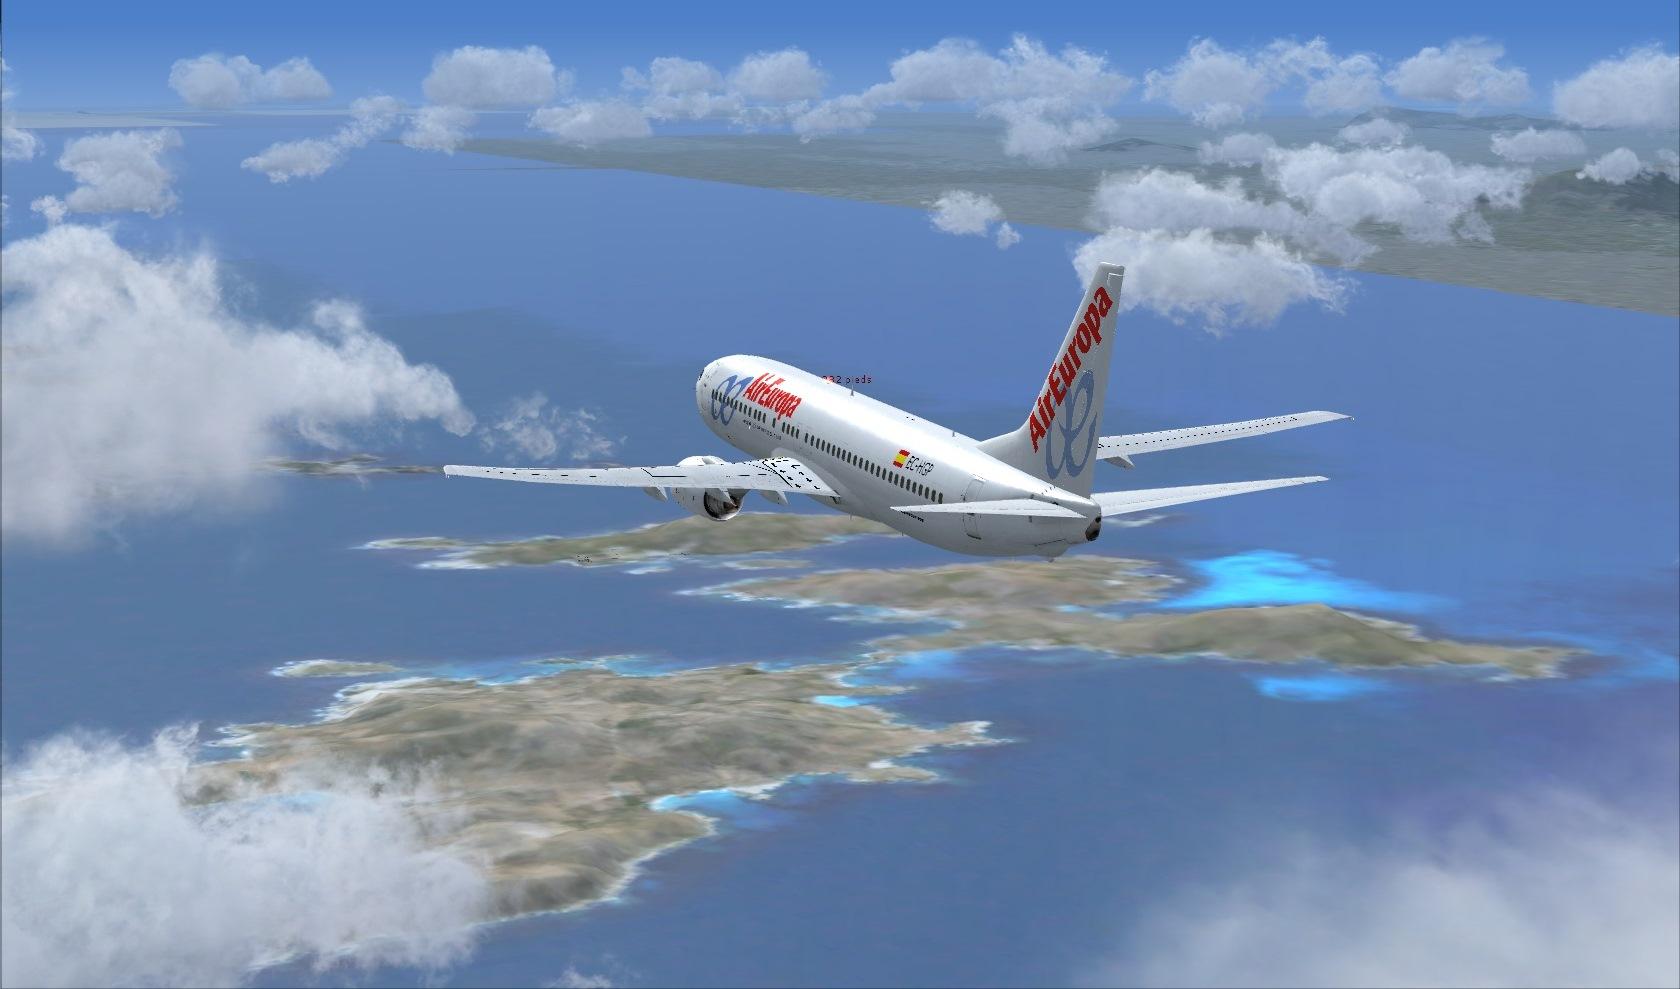 First landing Mykonos 8840930583_46c0ea5a1b_o